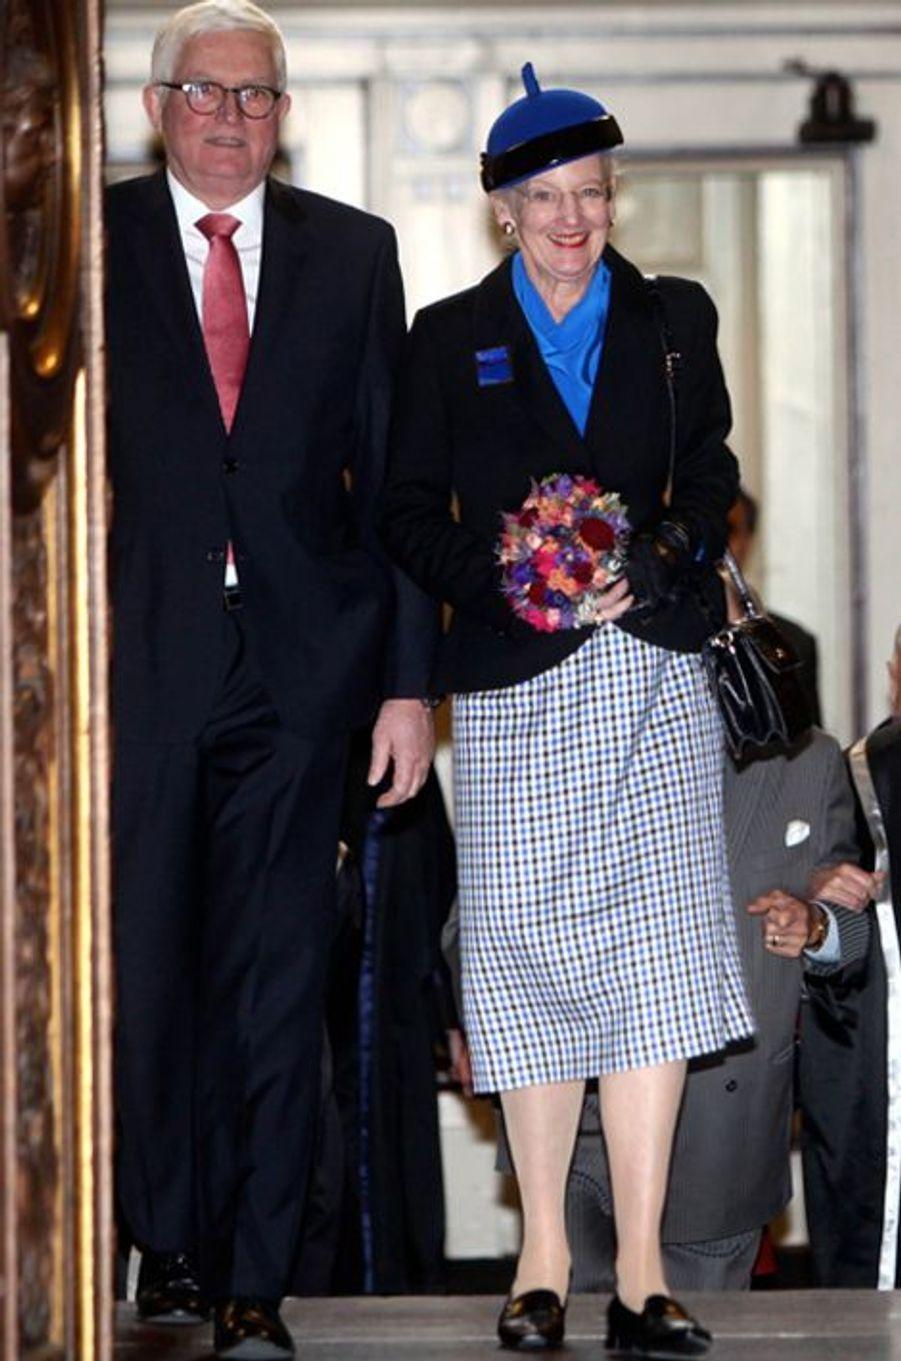 La reine Margrethe II de Danemark, le 20 novembre 2015